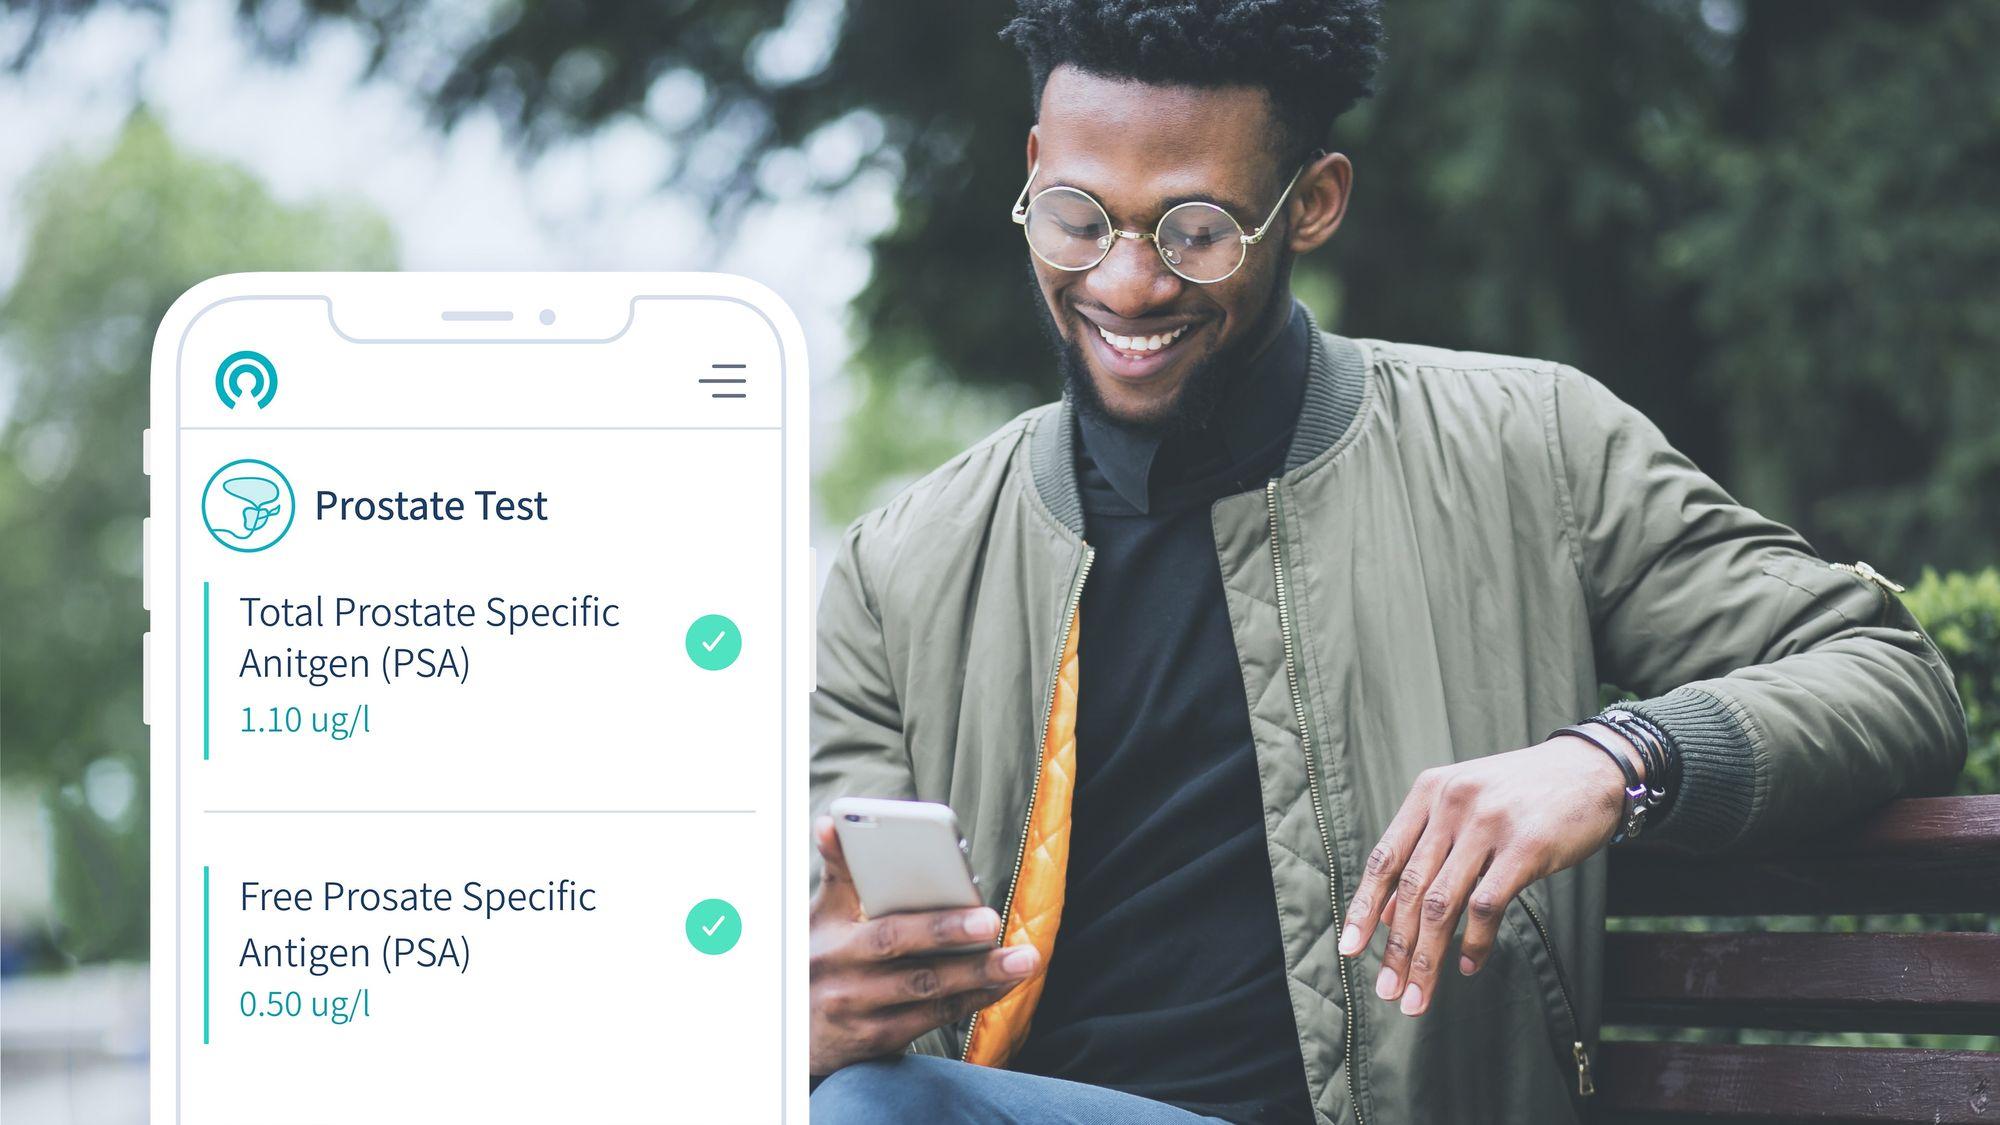 App_Screen_Prostate_Test  1